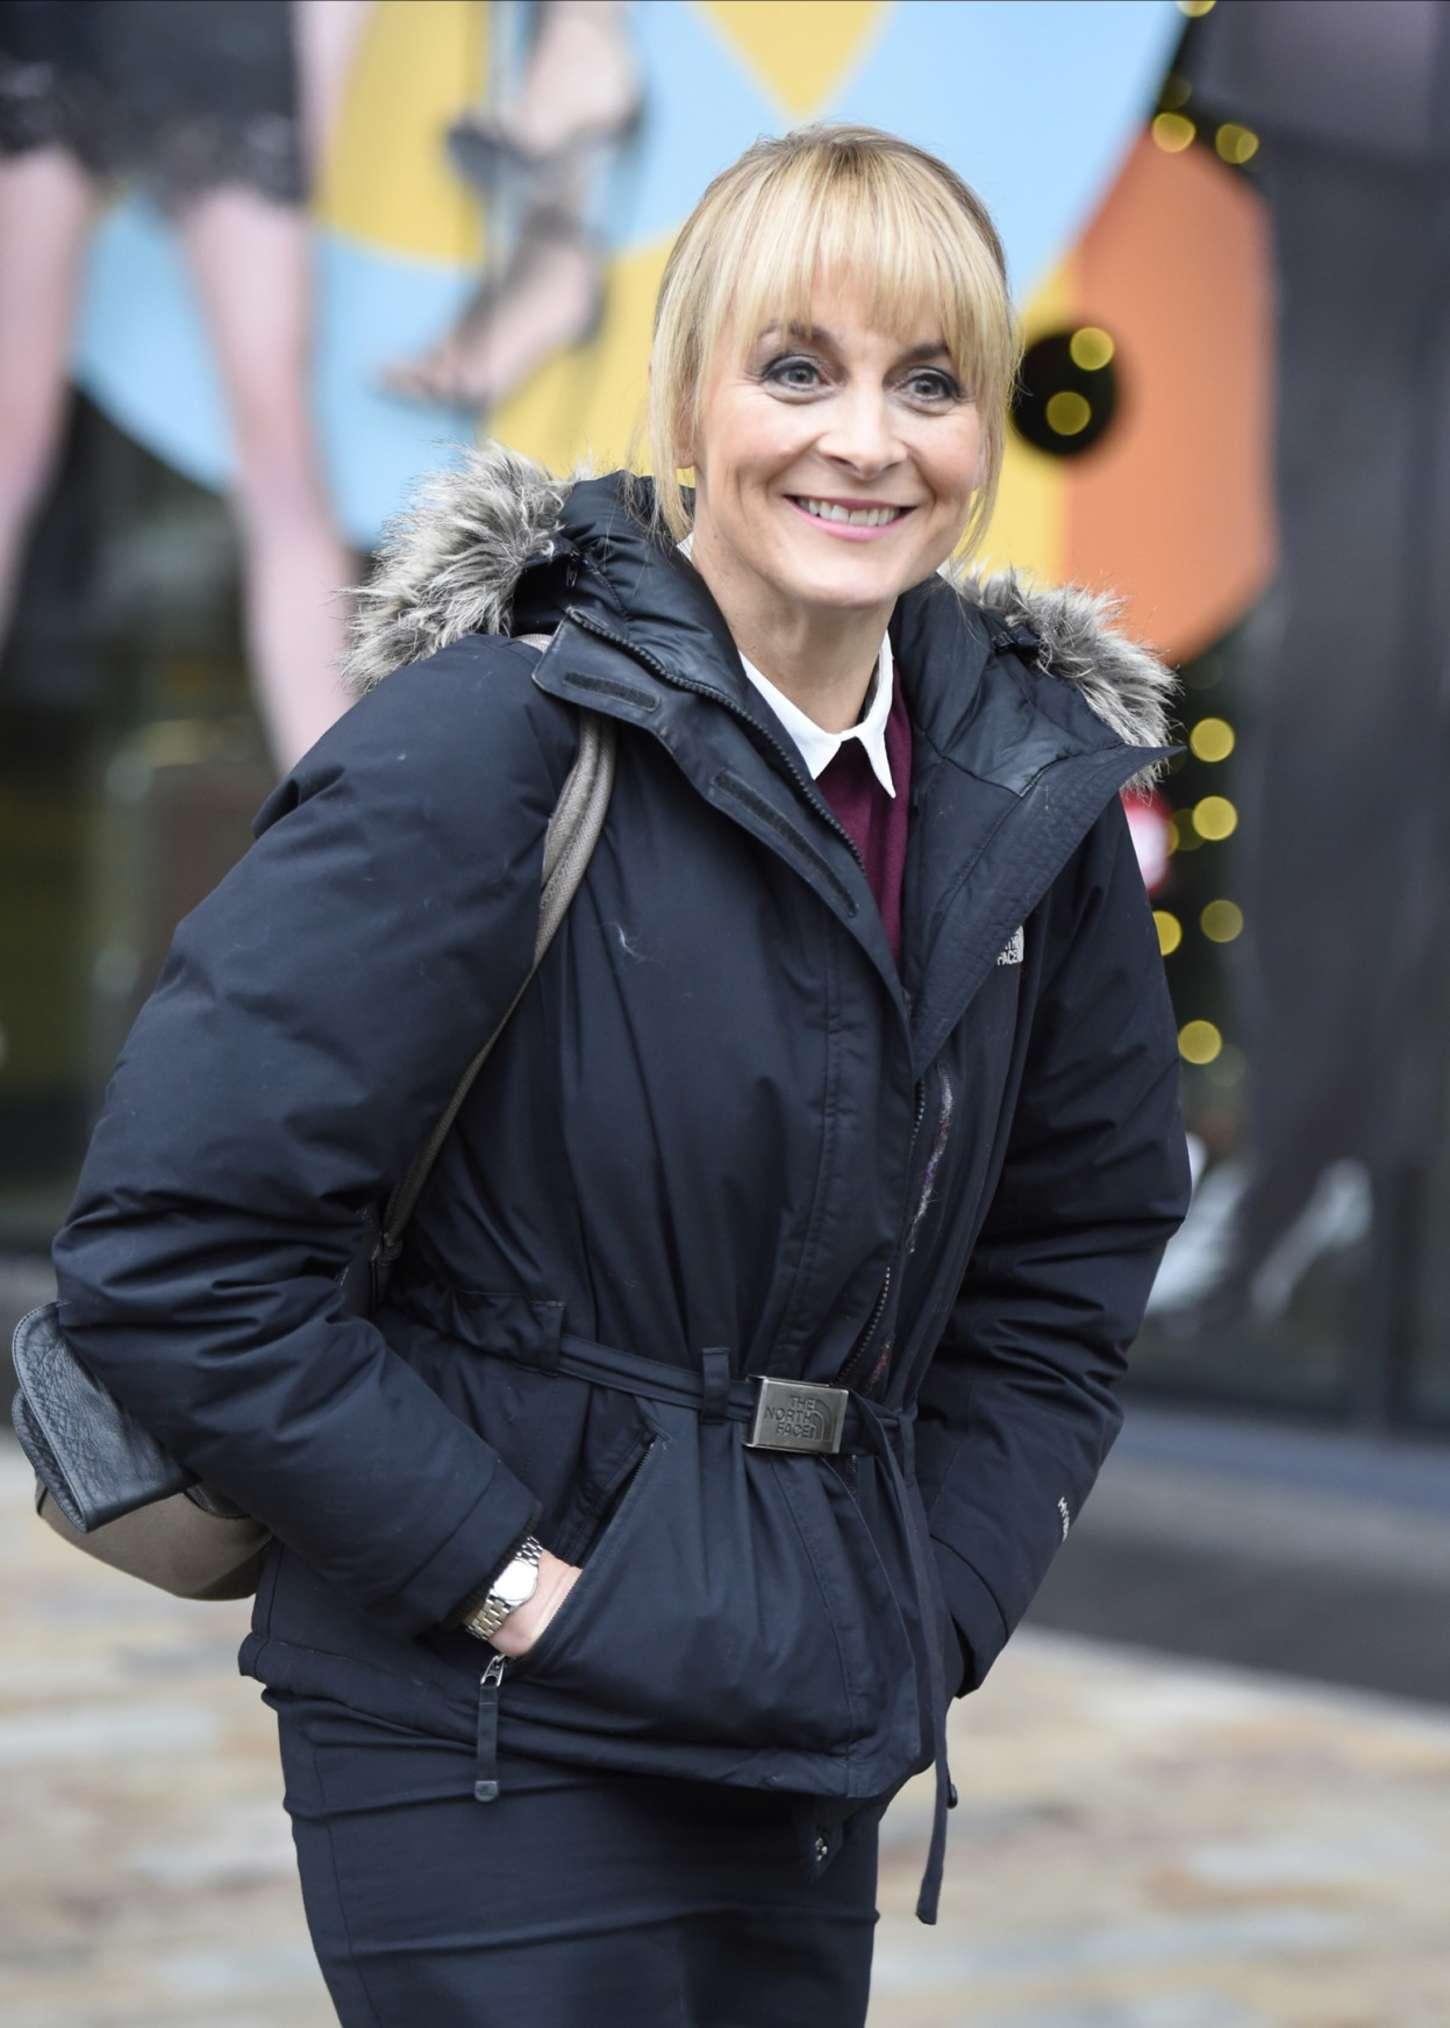 Louise Minchin at BBC Media City in London – Celebrity Wiki -> onceleb.wiki